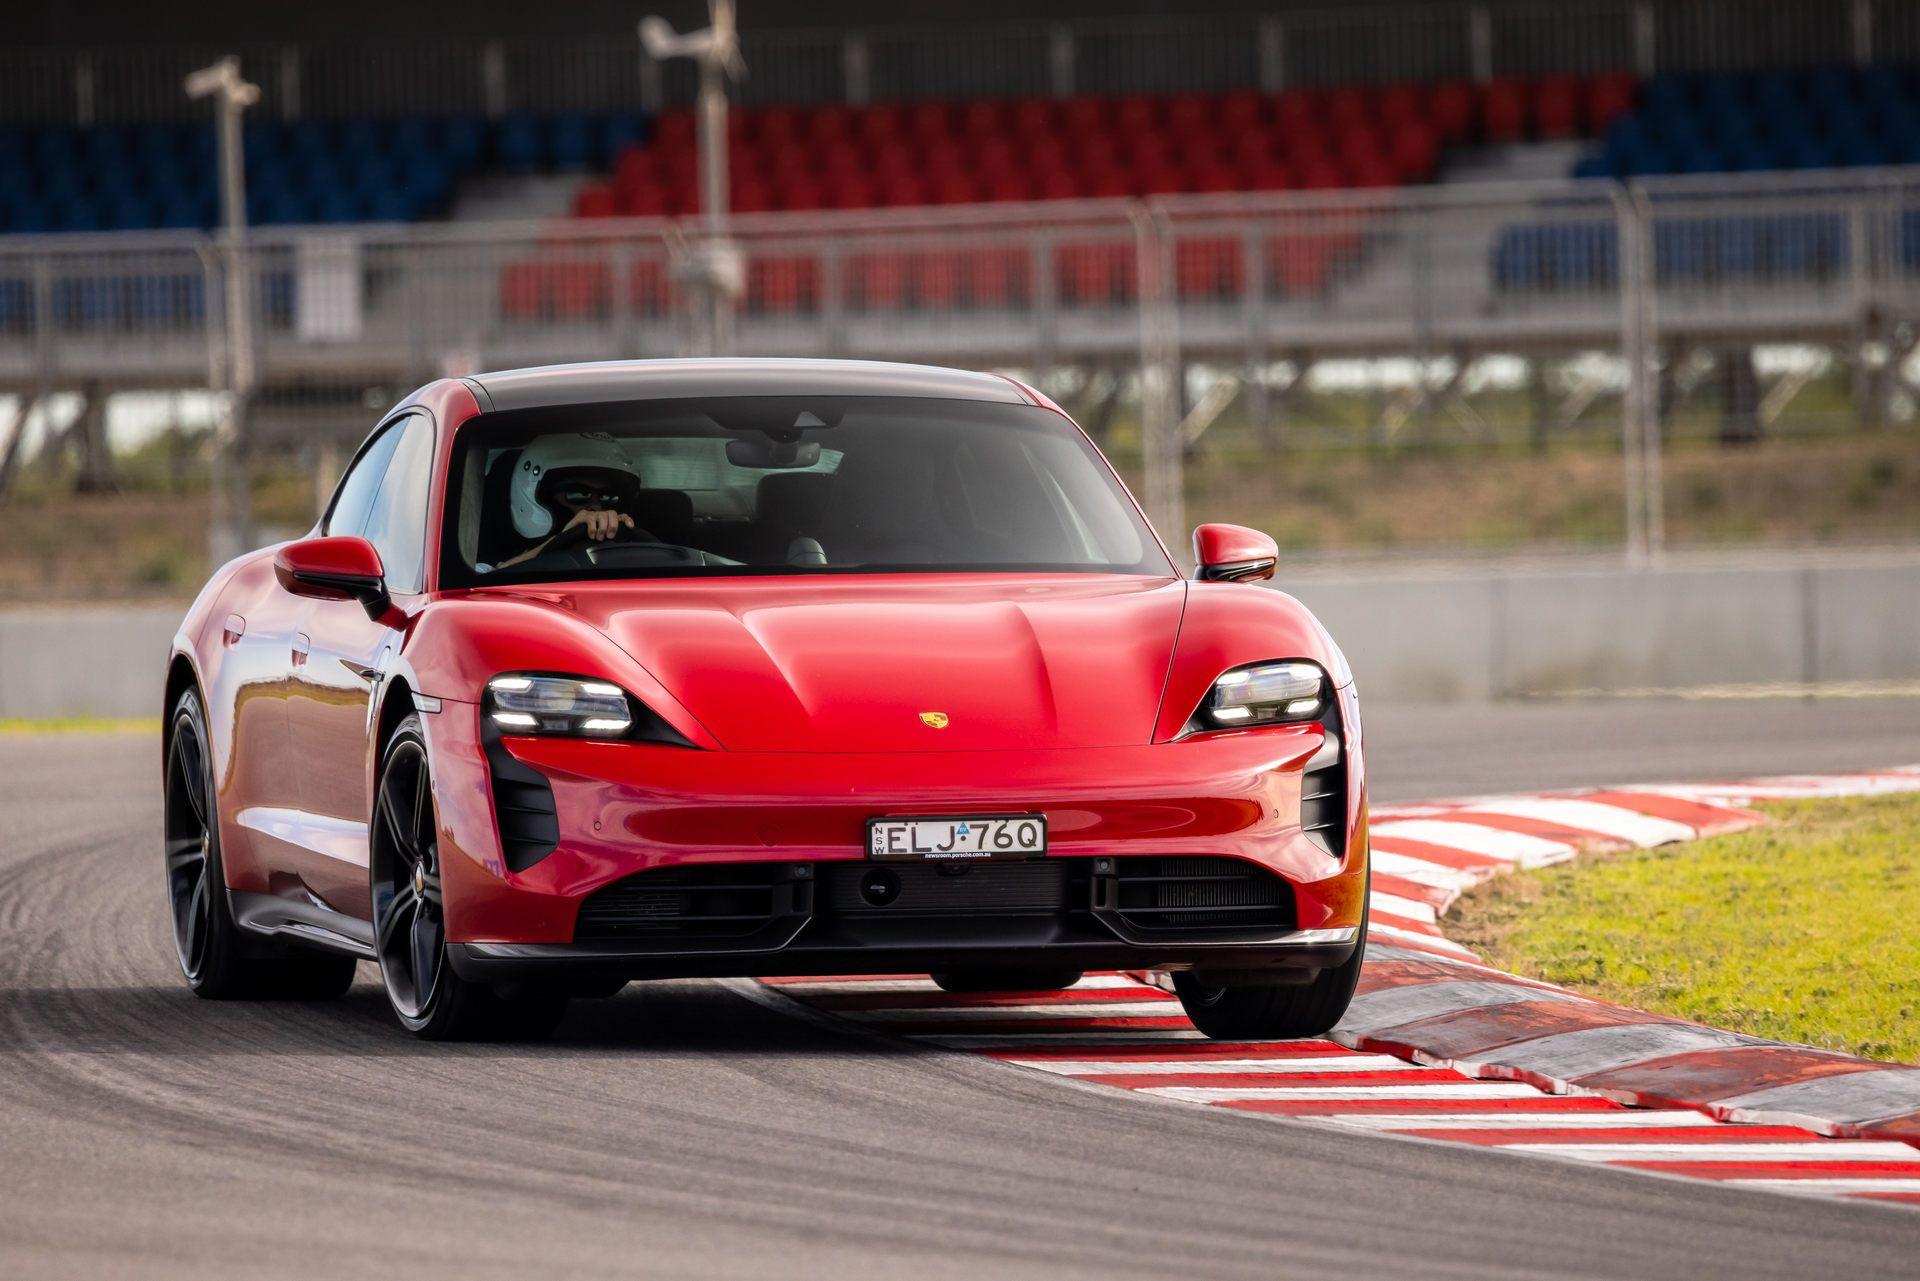 Porsche-Taycan-Turbo-S-The-Bend-Motorsport-Park-7